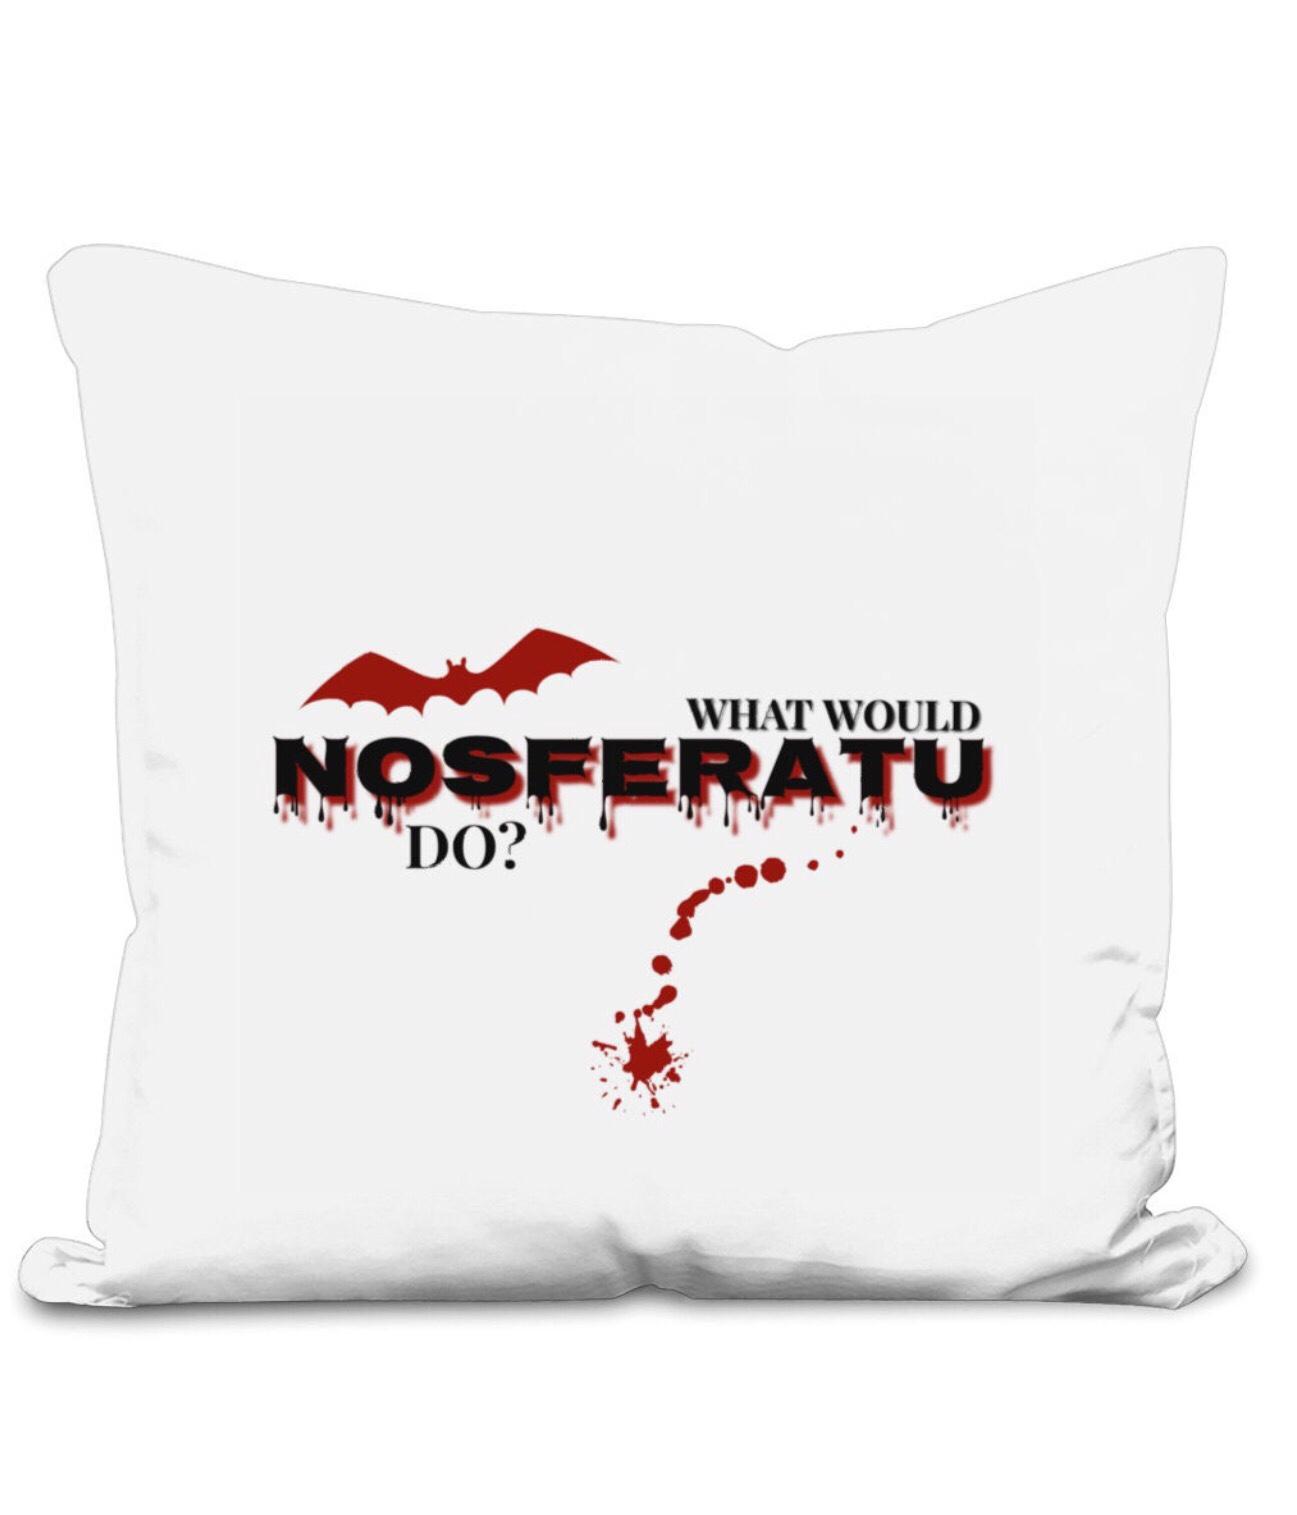 What Would Nosferatu Do?